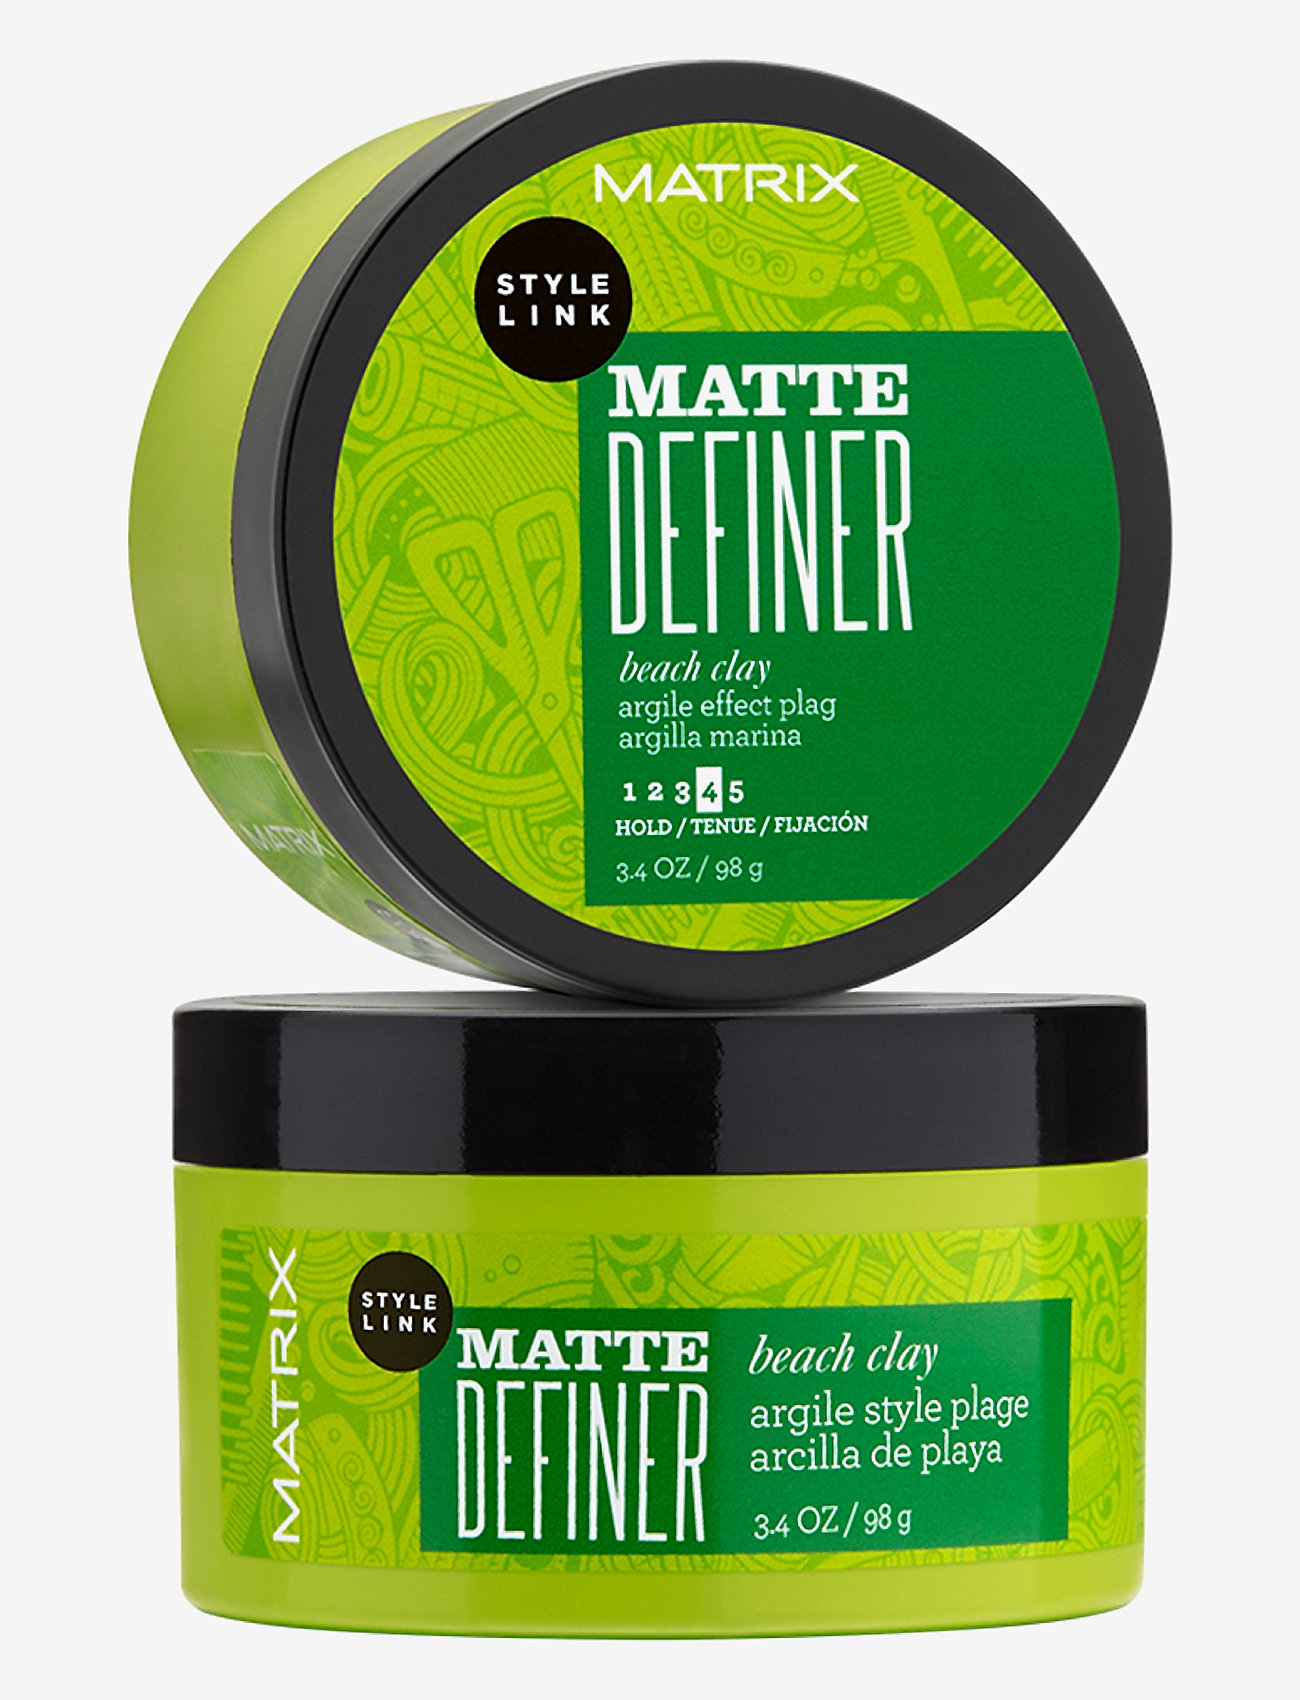 Matrix - Style Link Matte Definer Beach Clay - paste - clear - 0